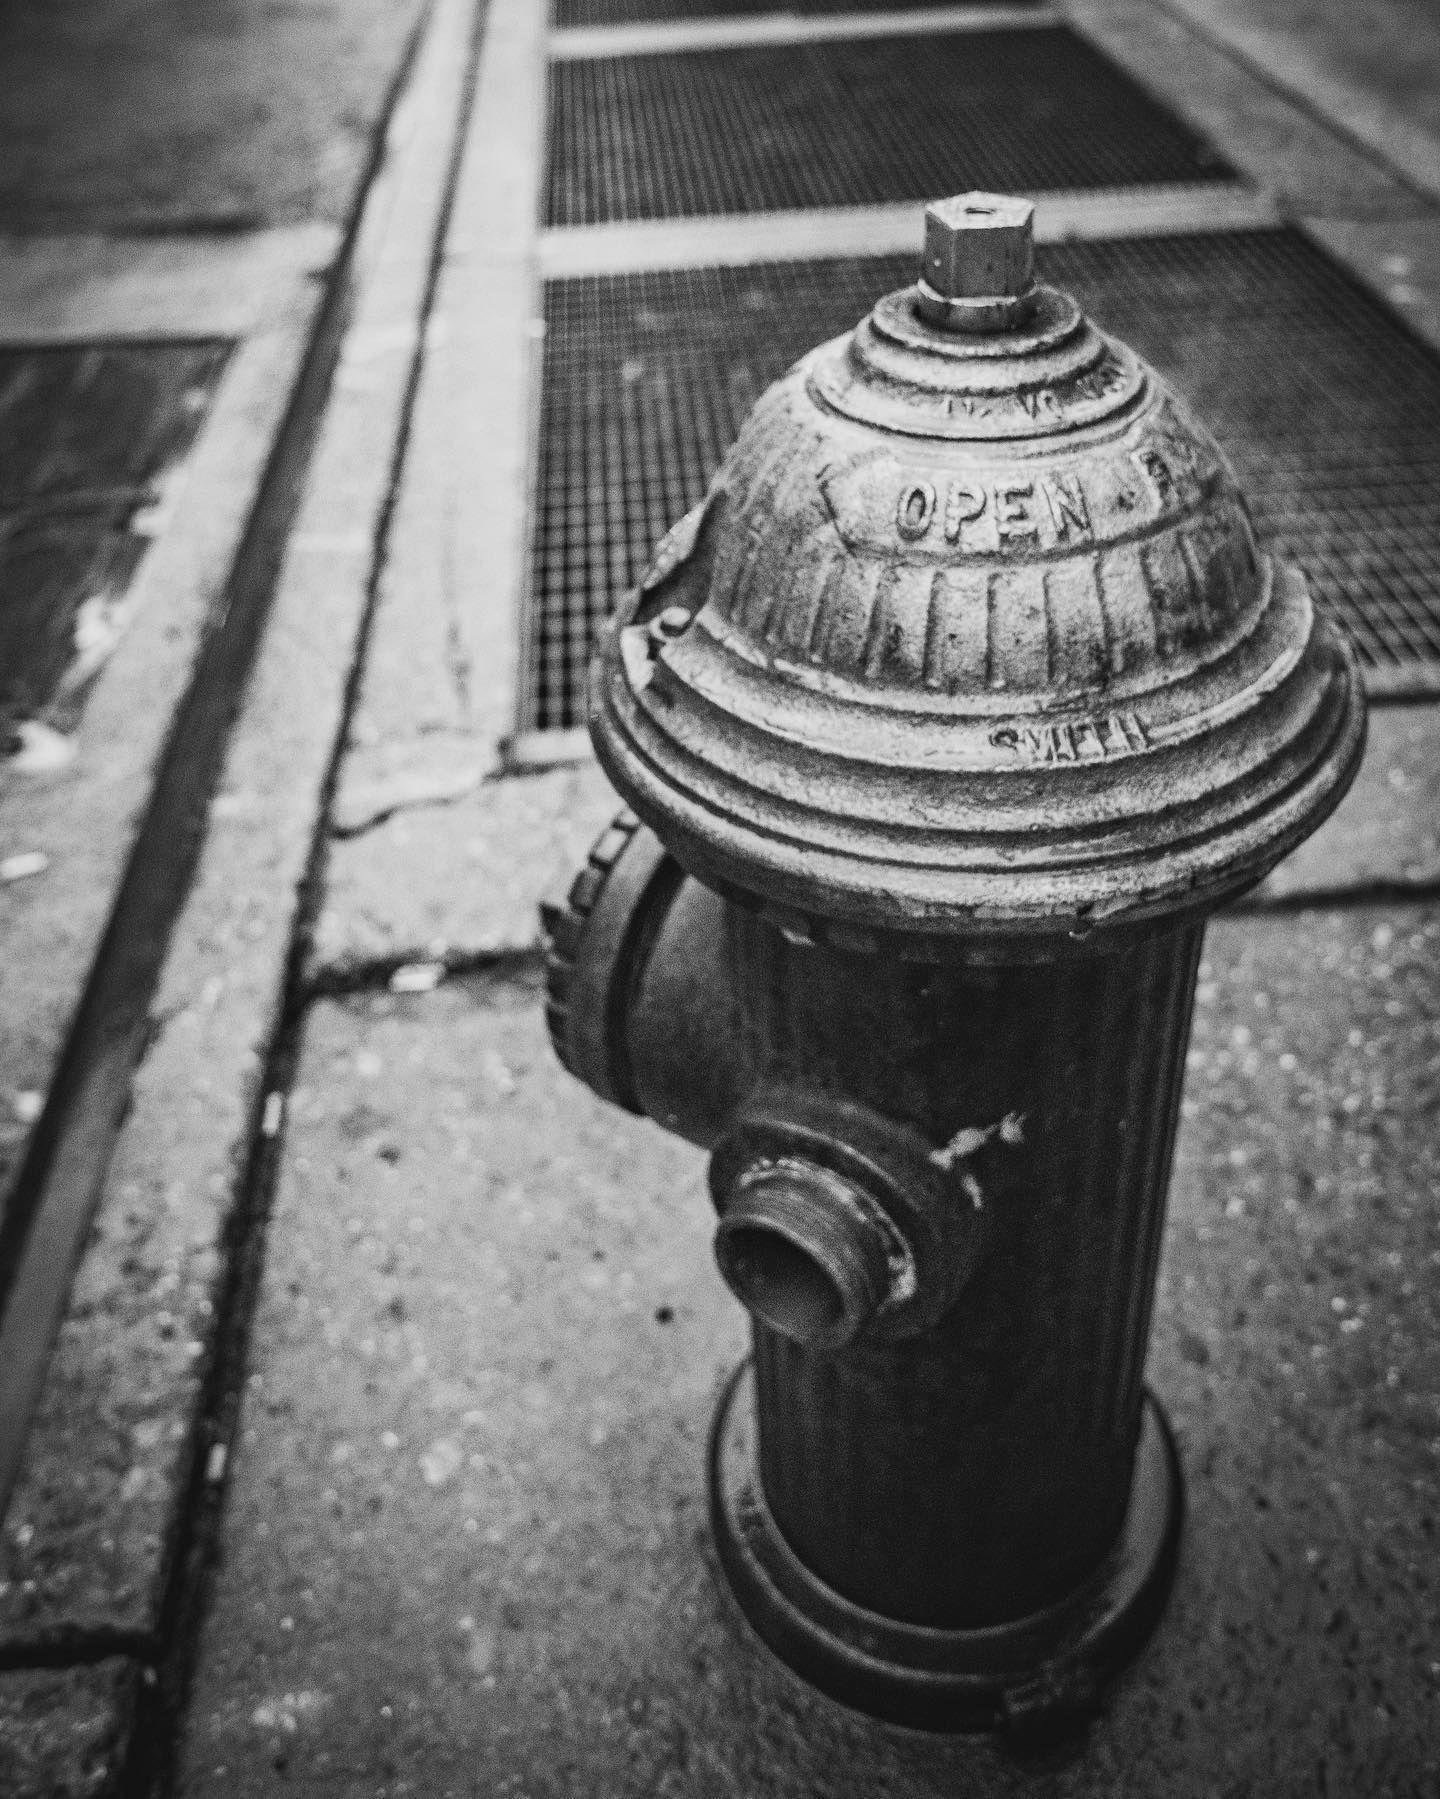 Fire Hydrant  #onichie #osaka #japan #osakajapan #大阪 #日本 #オニッチ #おにっち #fromosaka #fromjapan #omg #onichiemusicgarage #ツァイスBatisで撮りたい #aestheticsjapan #shotonlexar #newyork #newyorkcity #nyc #firehydrant #消火栓